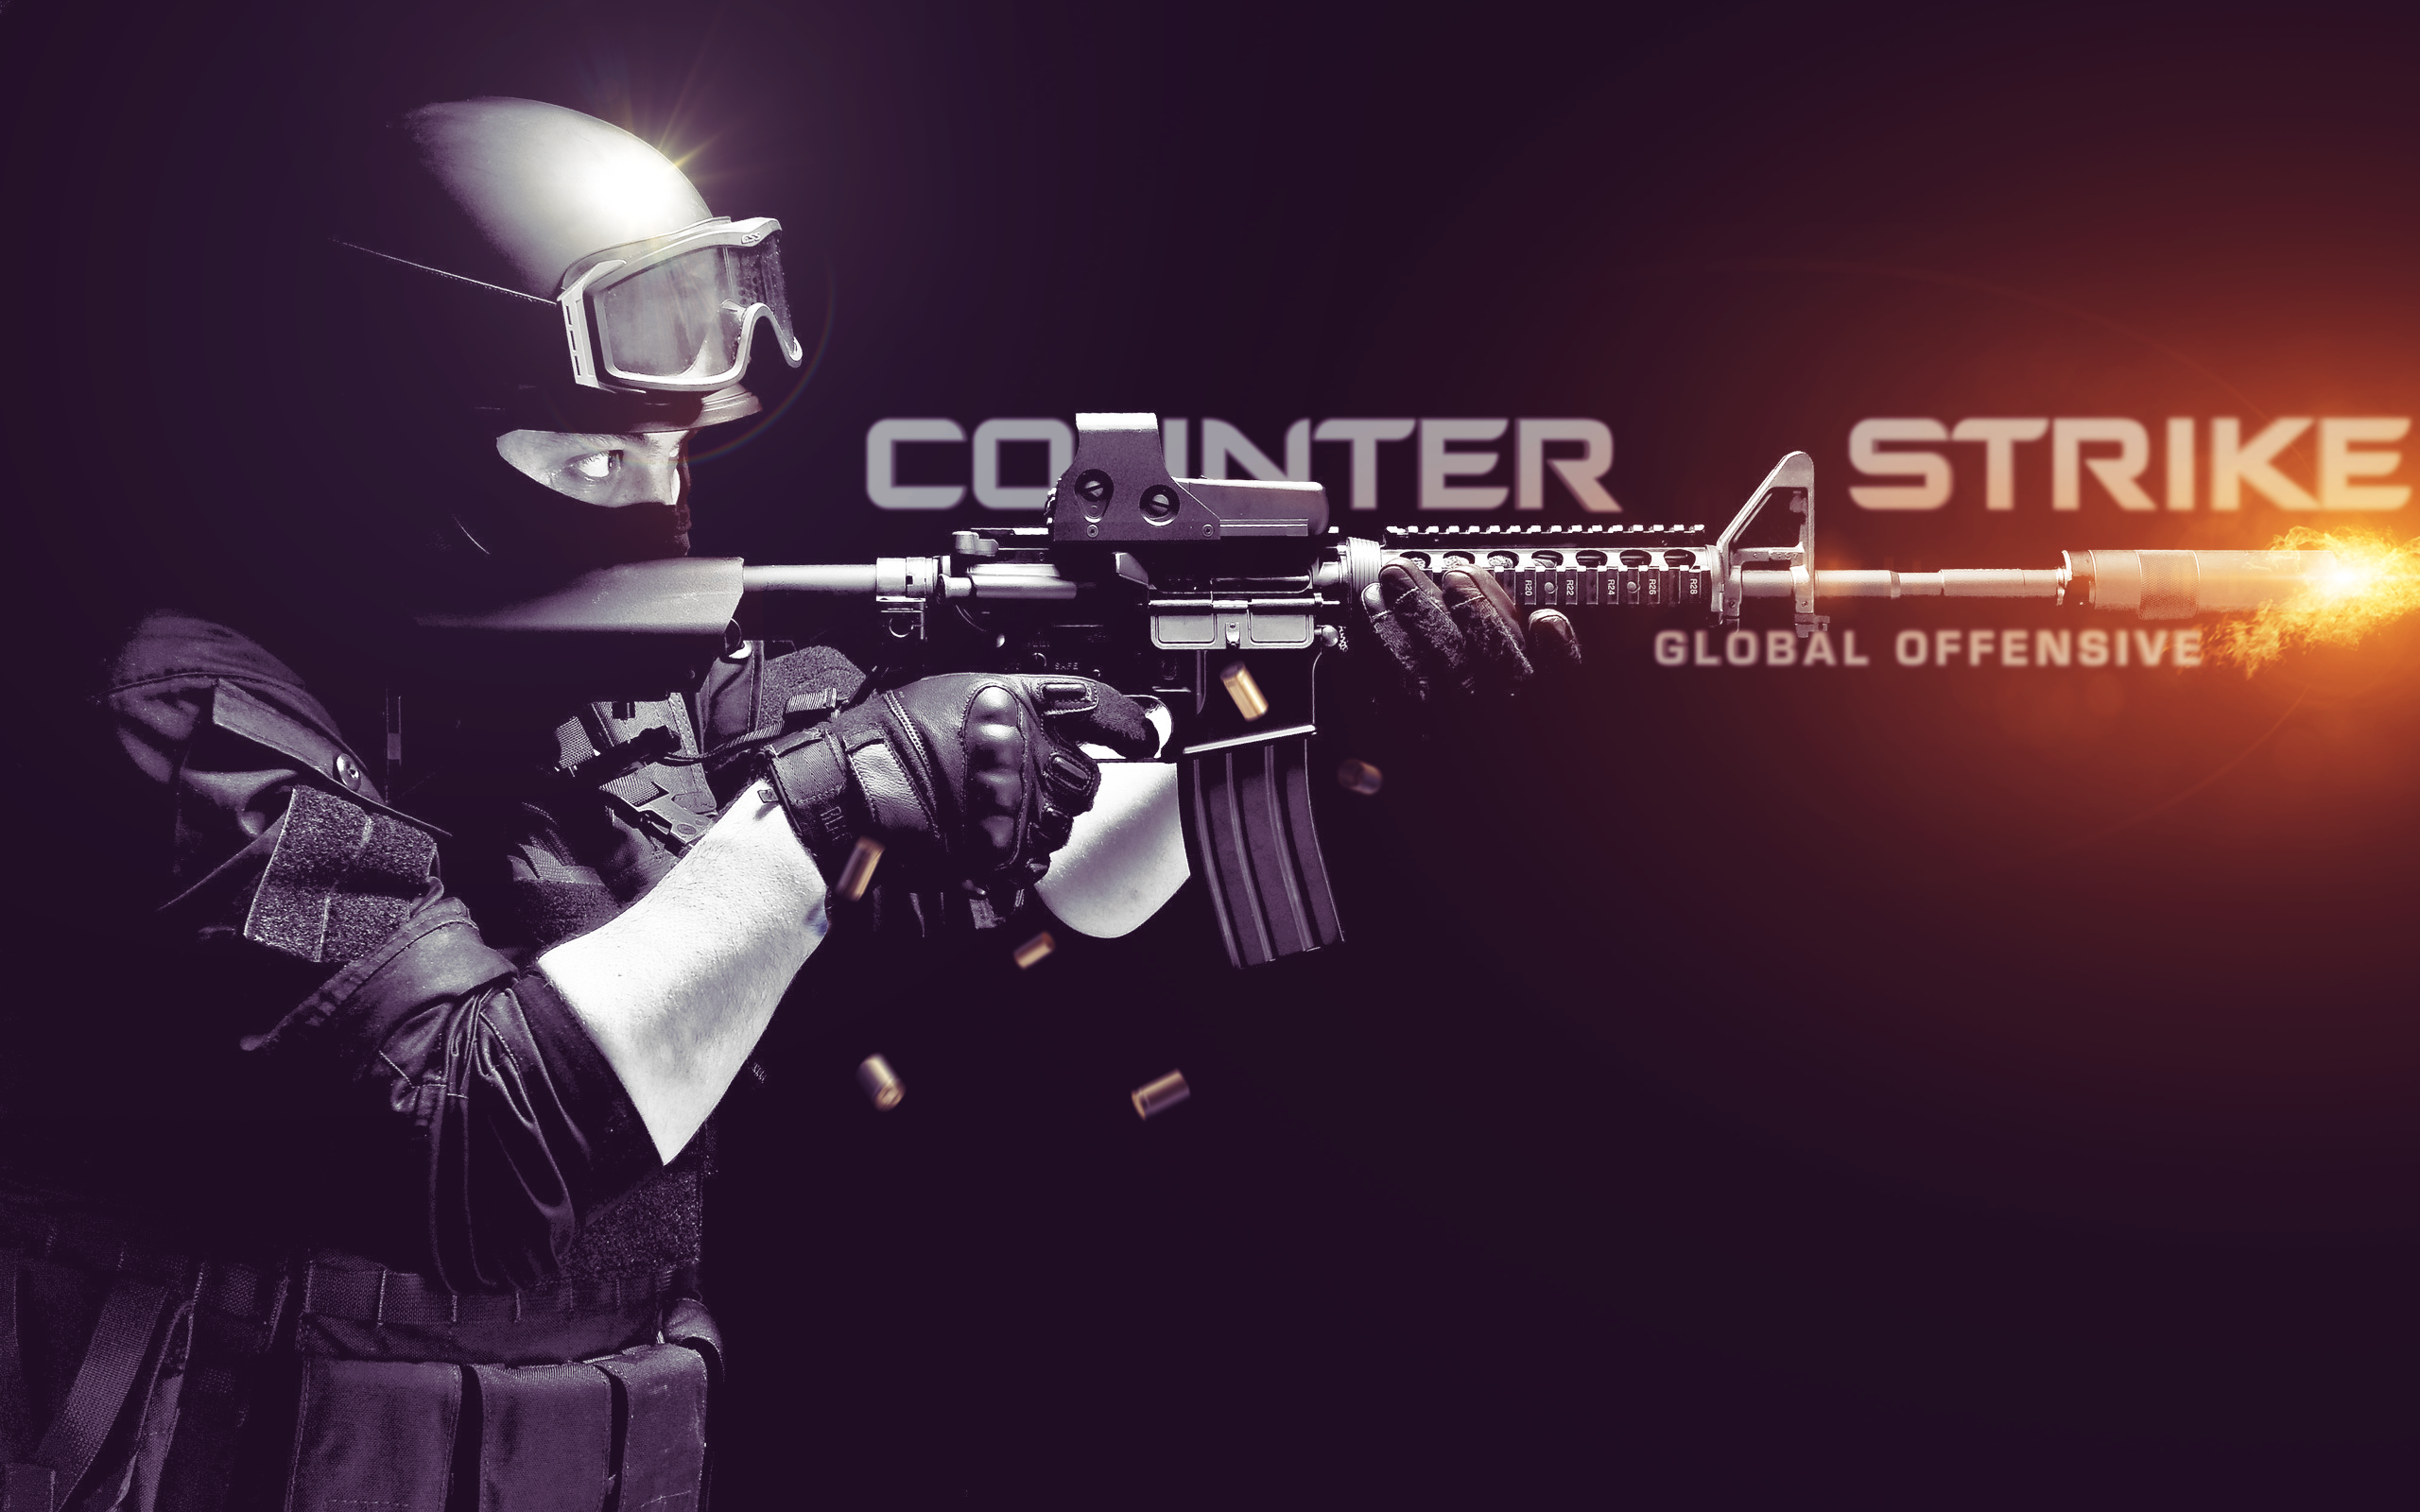 Counter Strike Global Offensive HD